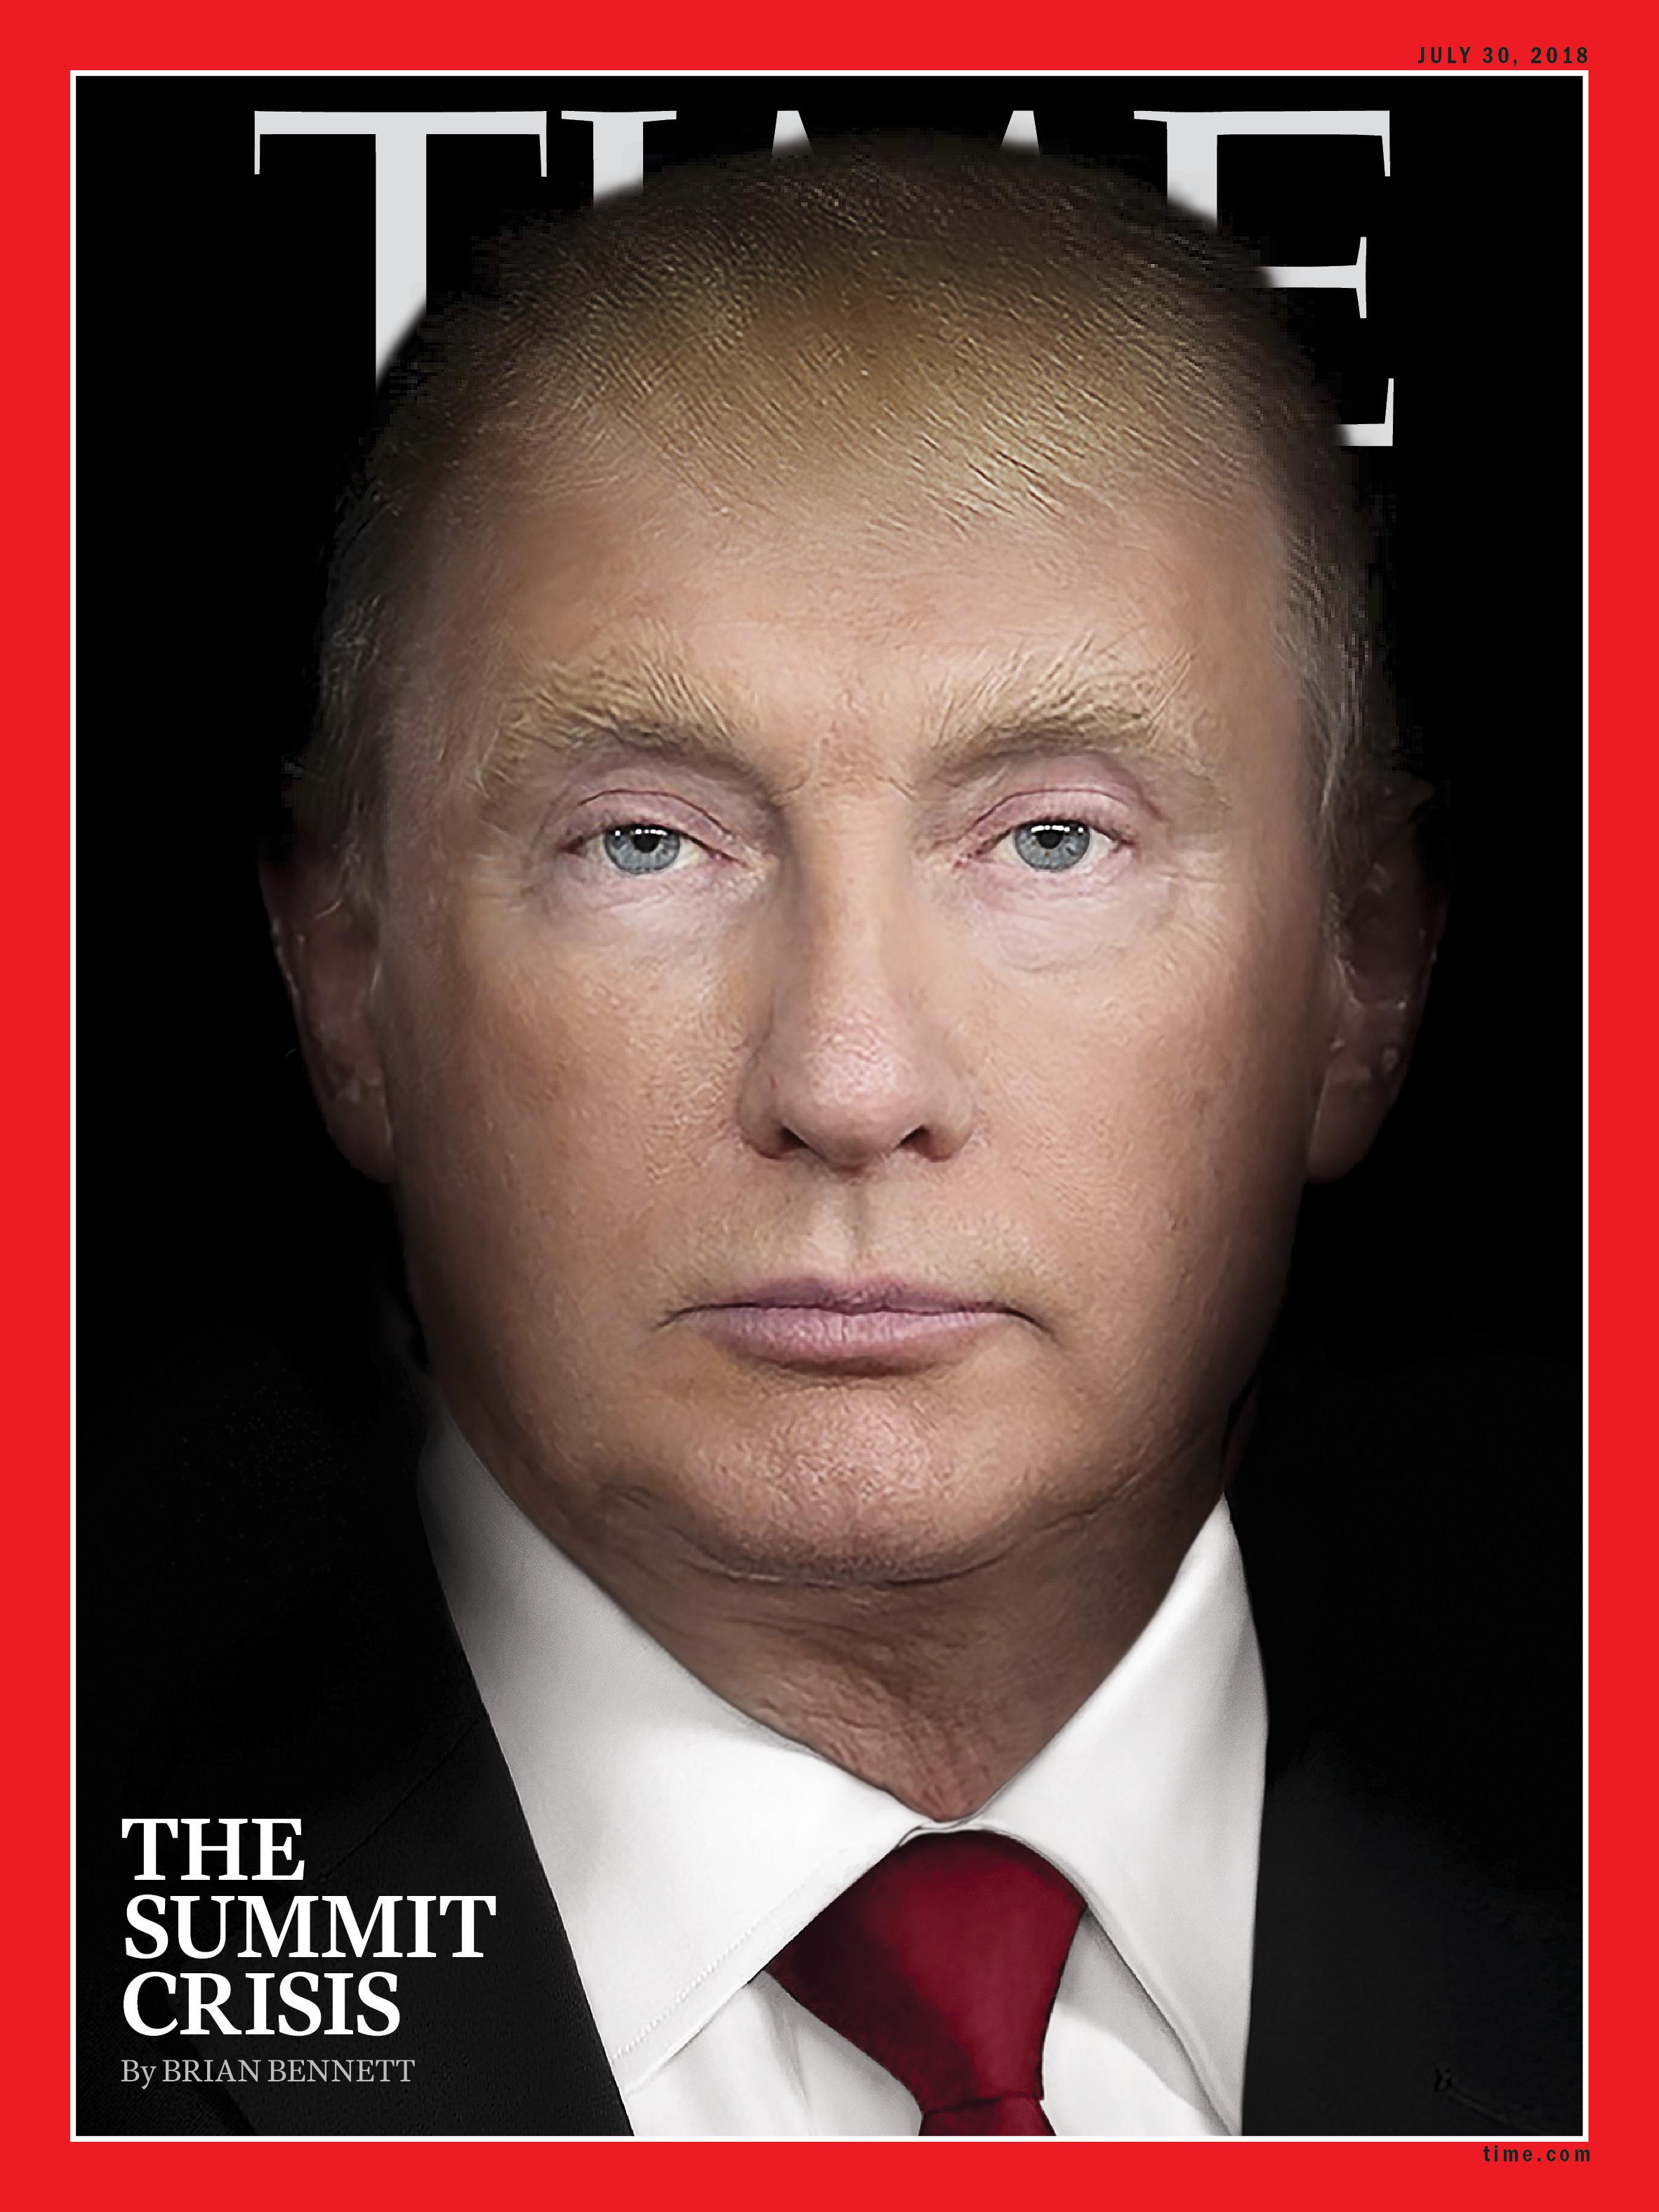 TrumpPutinFinalCover.jpg